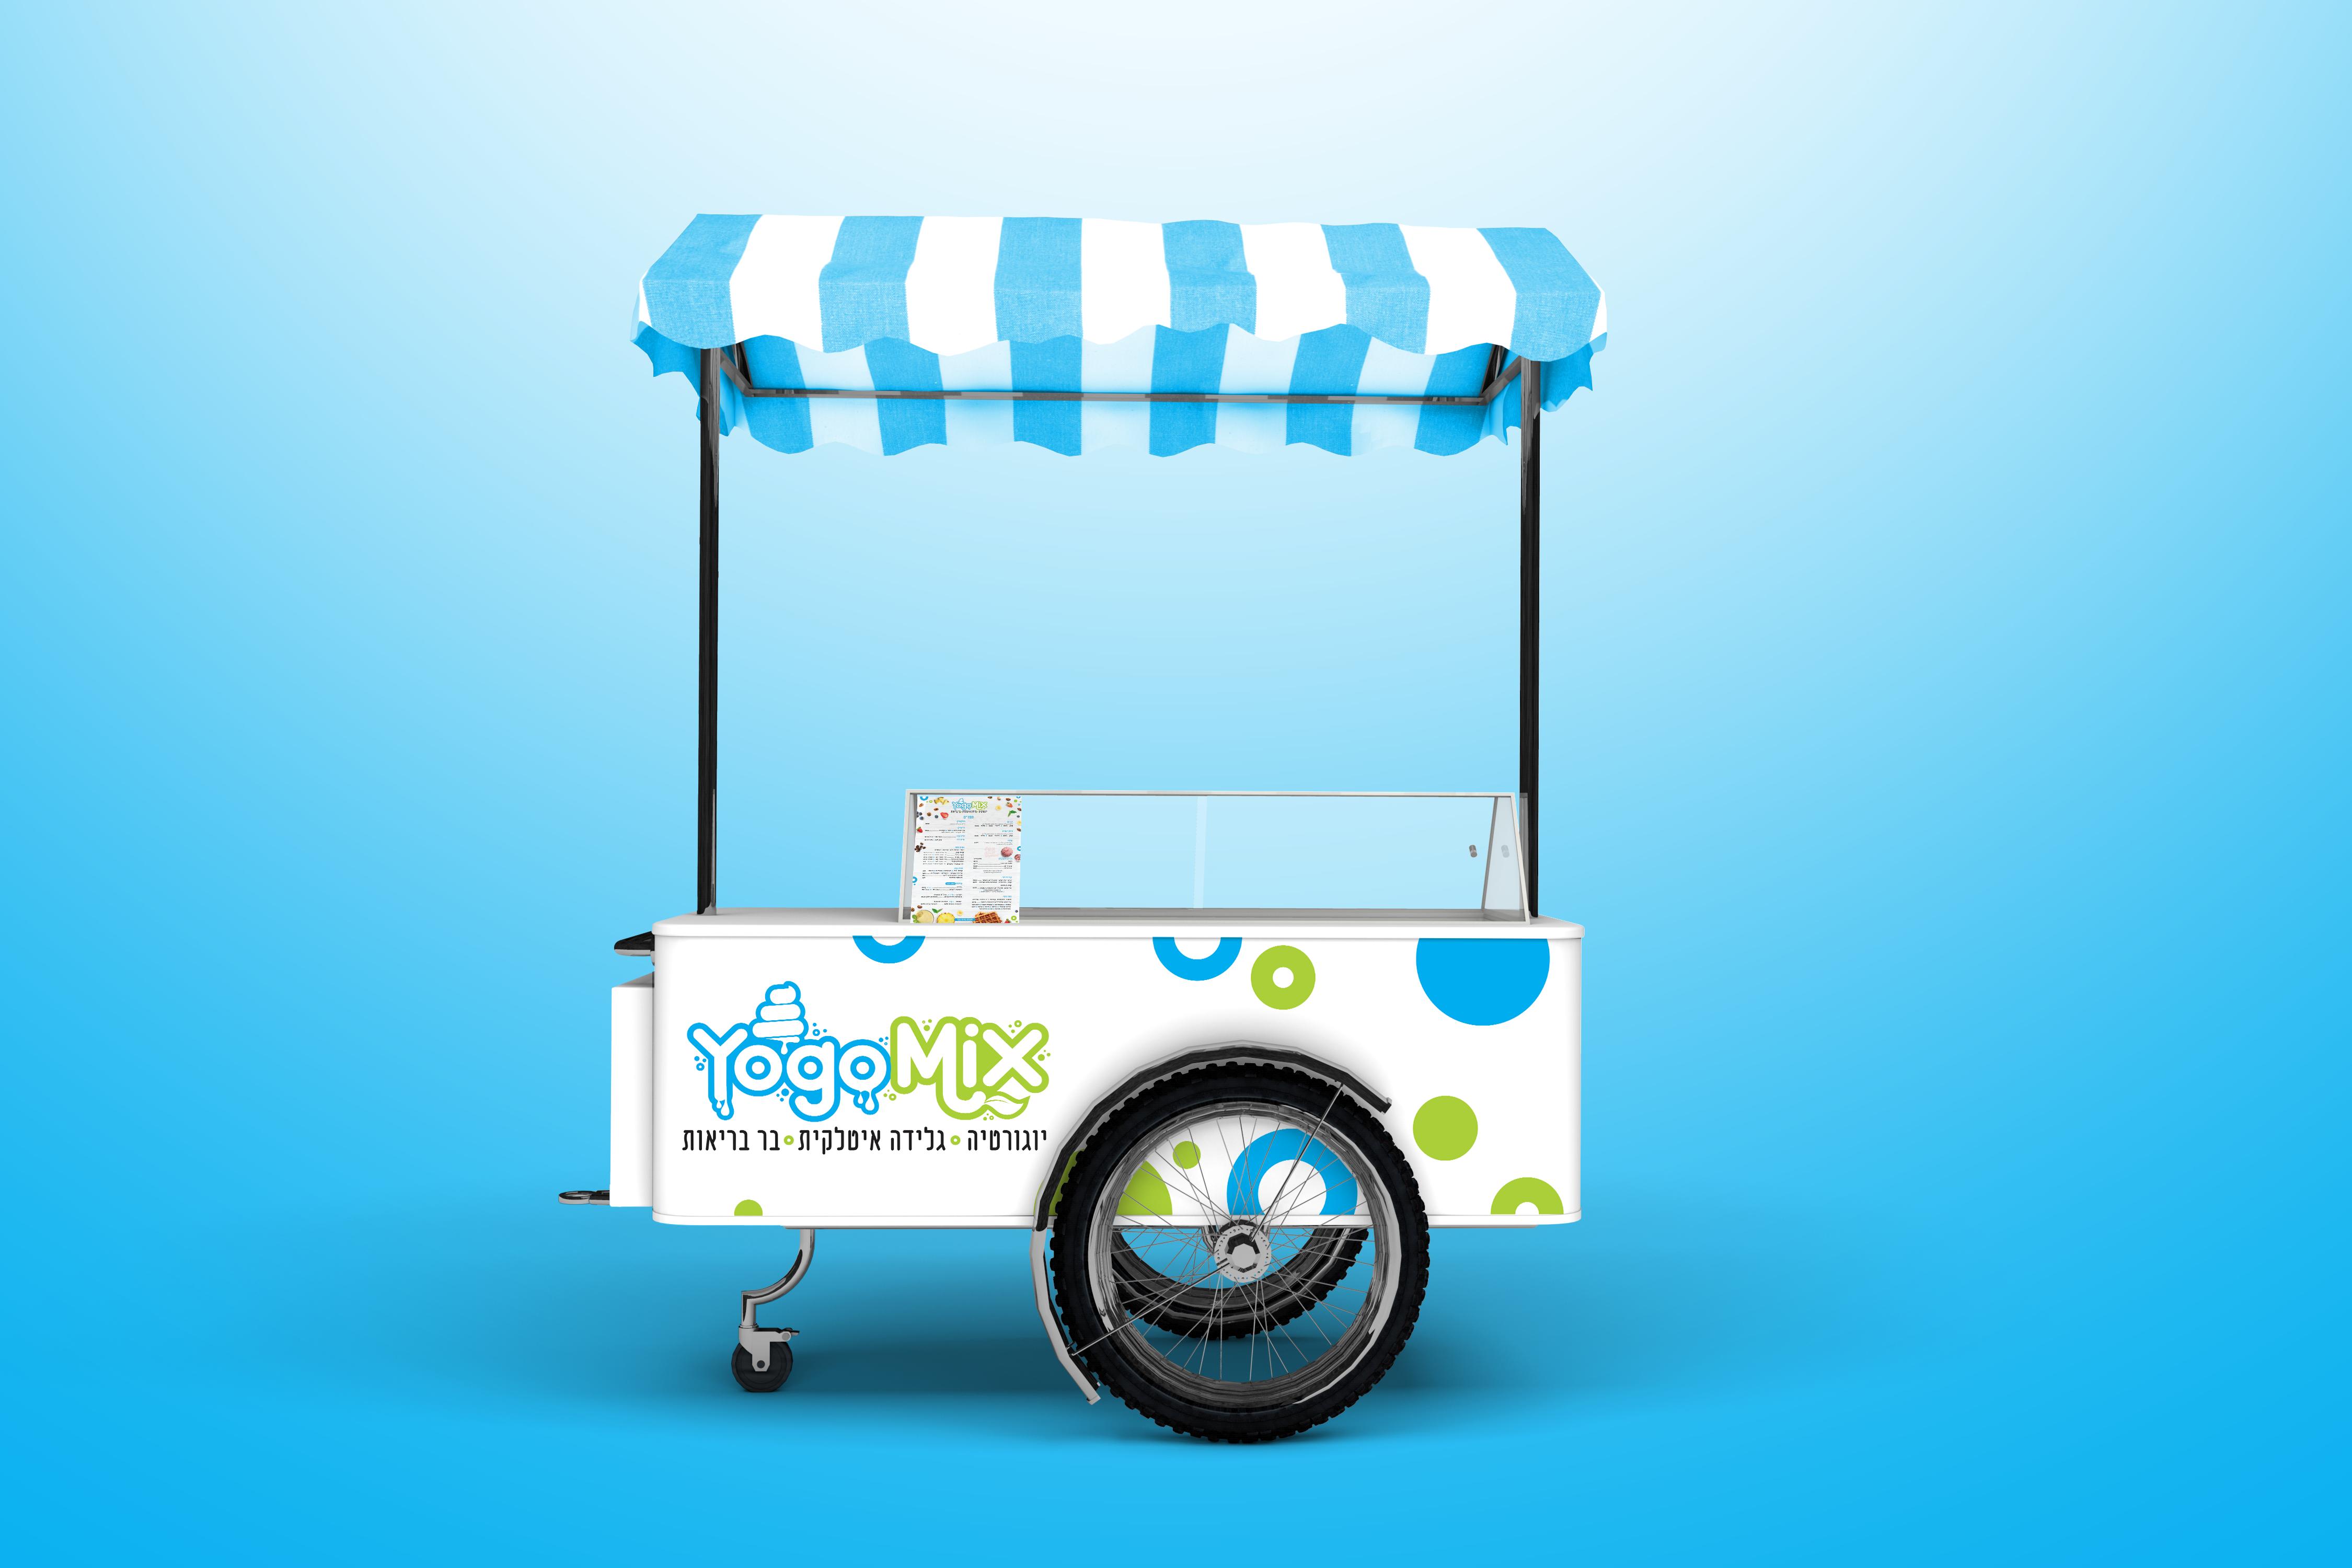 ice_cream_cart_4